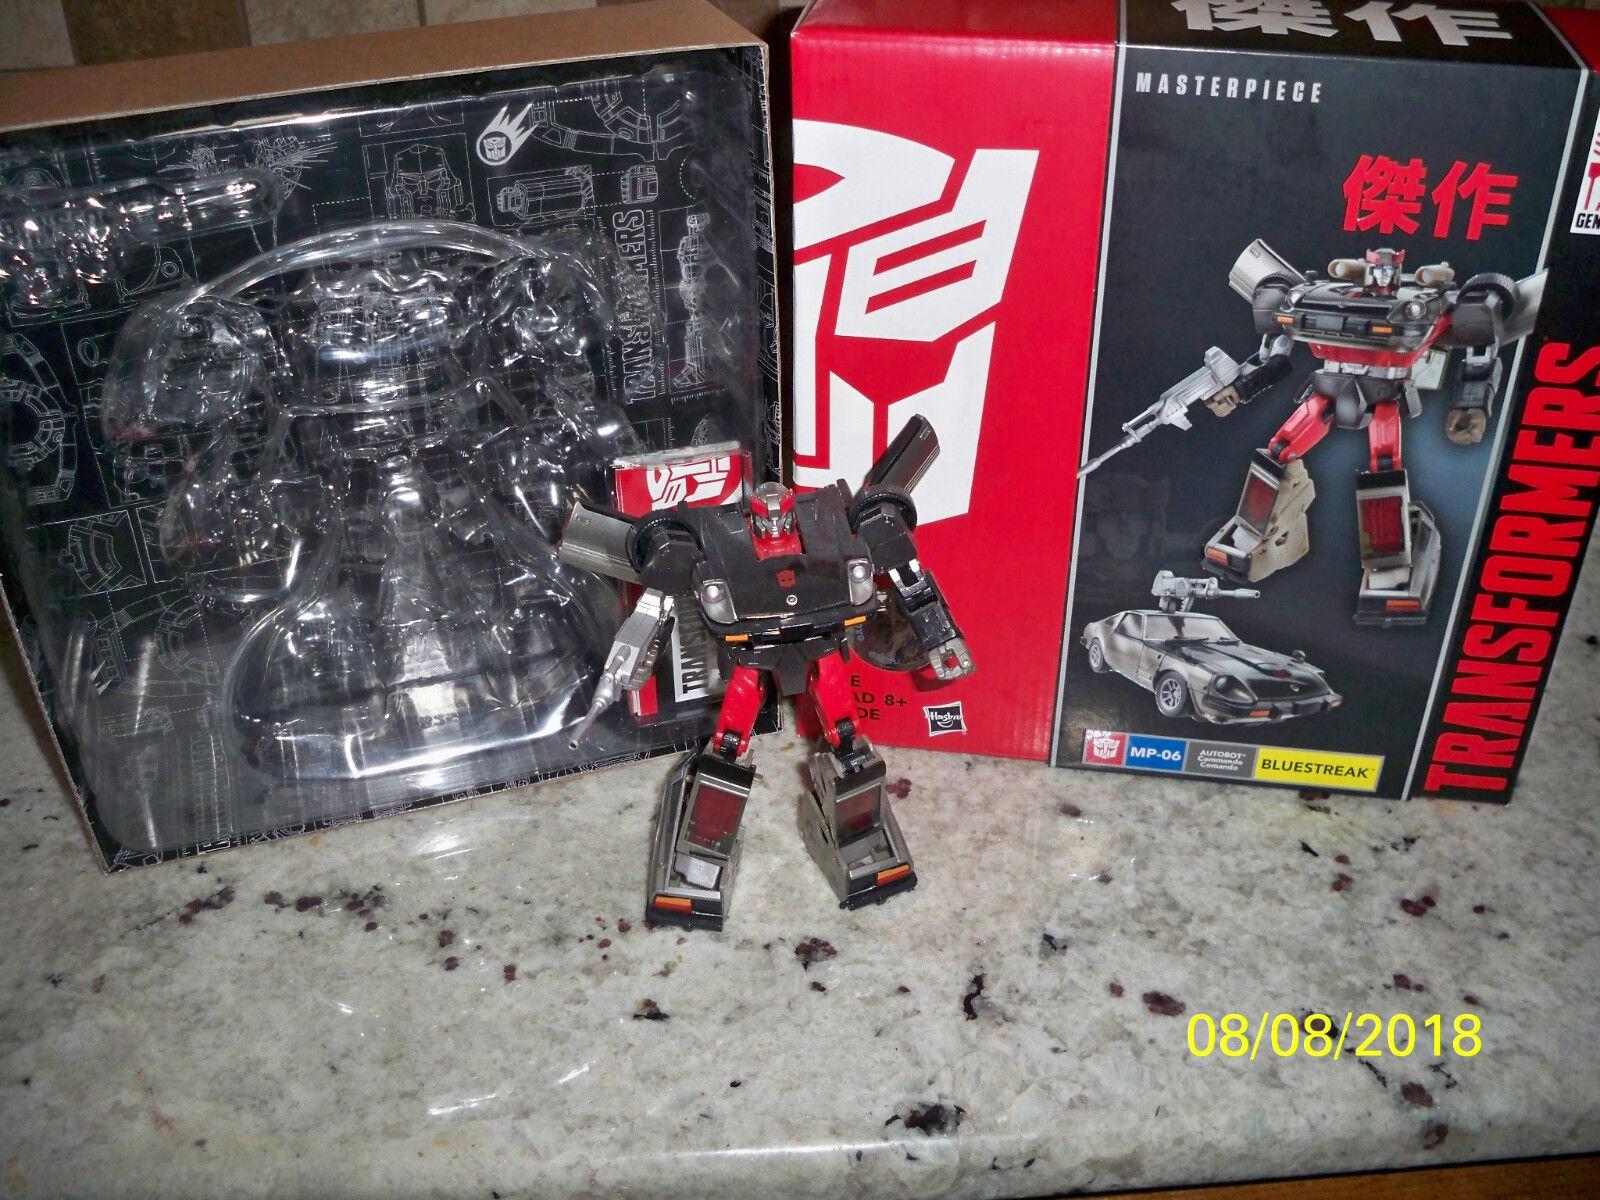 Transformers Takara Hasbro azulstreak Plata Y Rojo g1